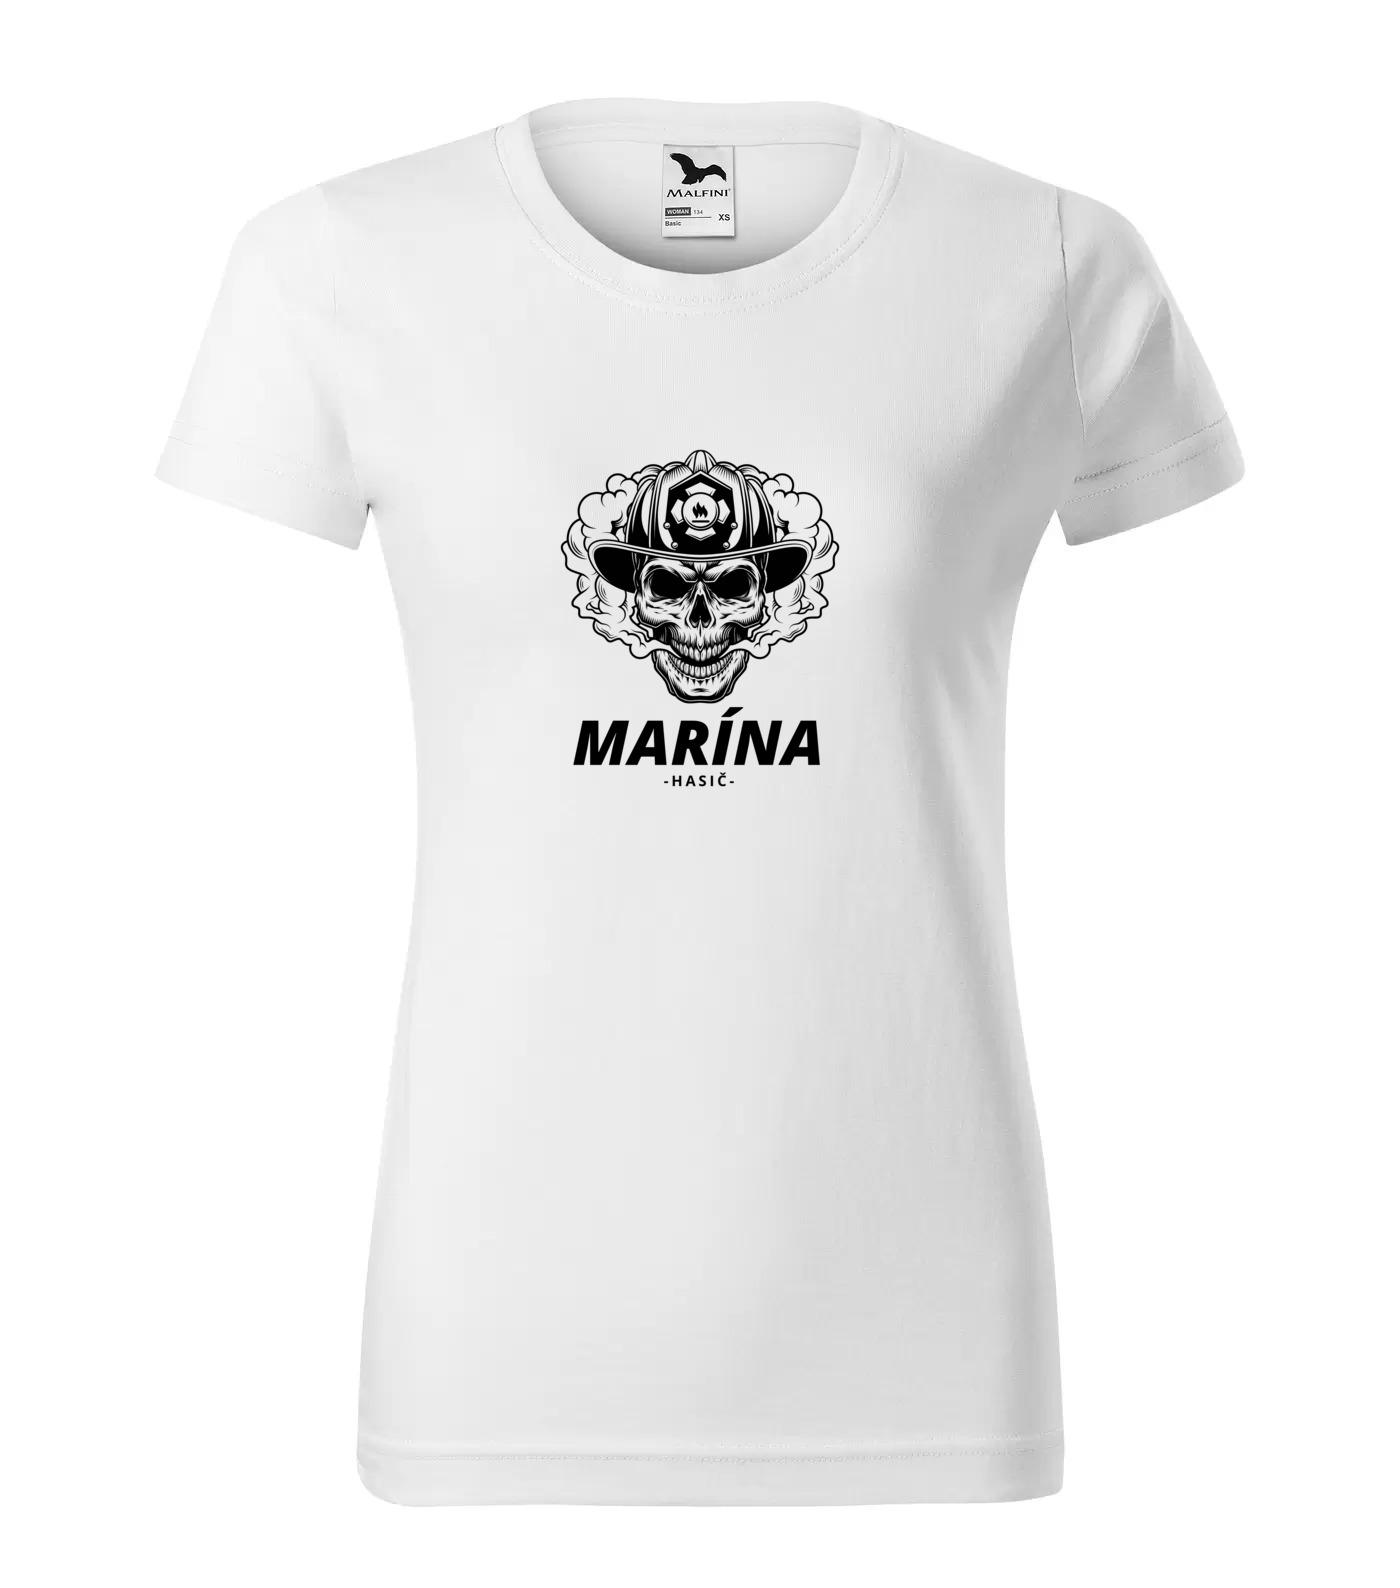 Tričko Hasič Marína